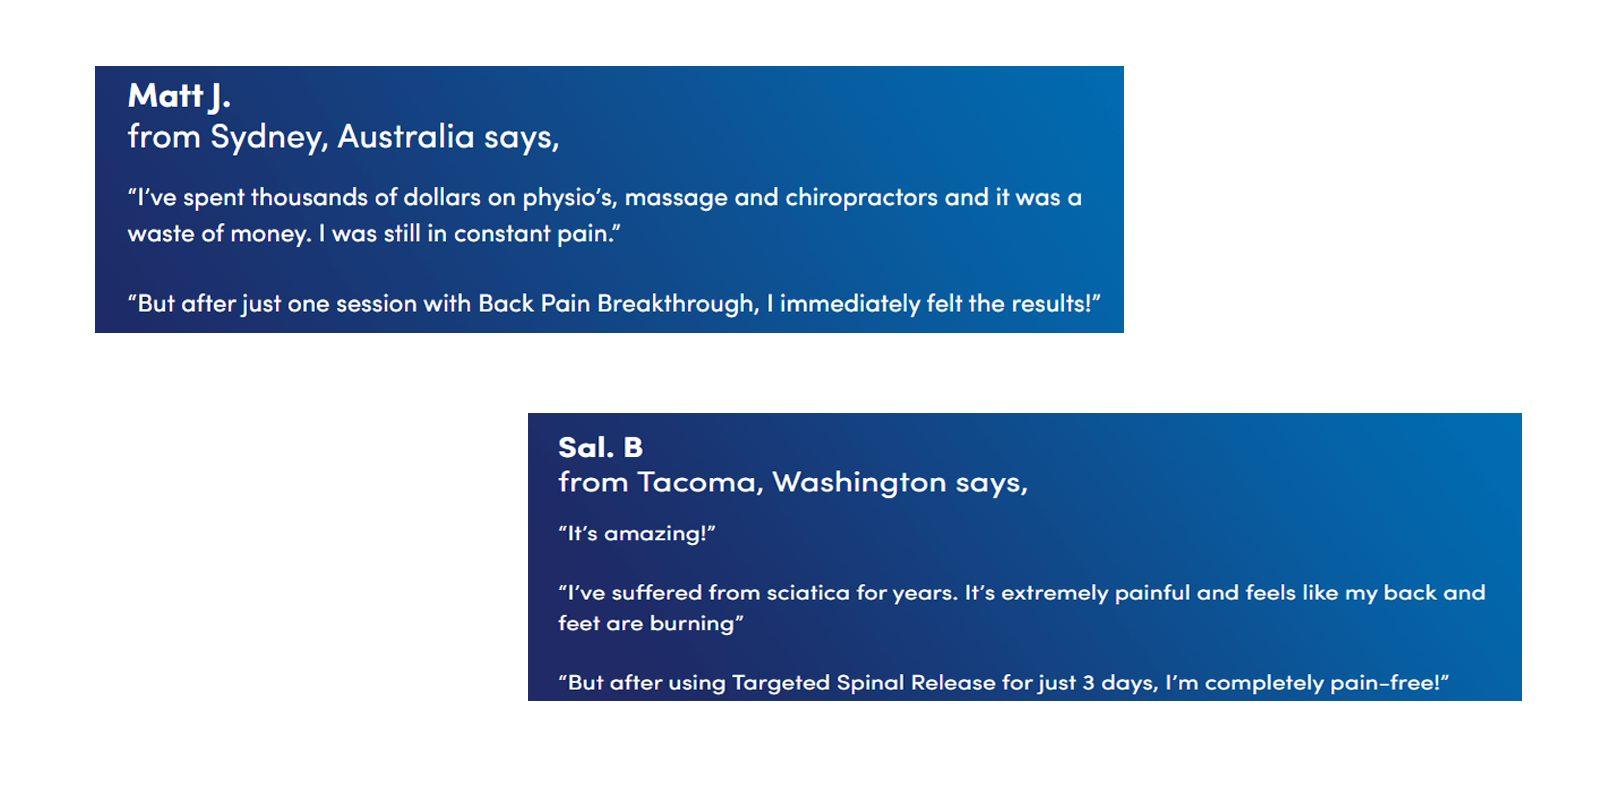 Back pain Breakthrough customer reviews